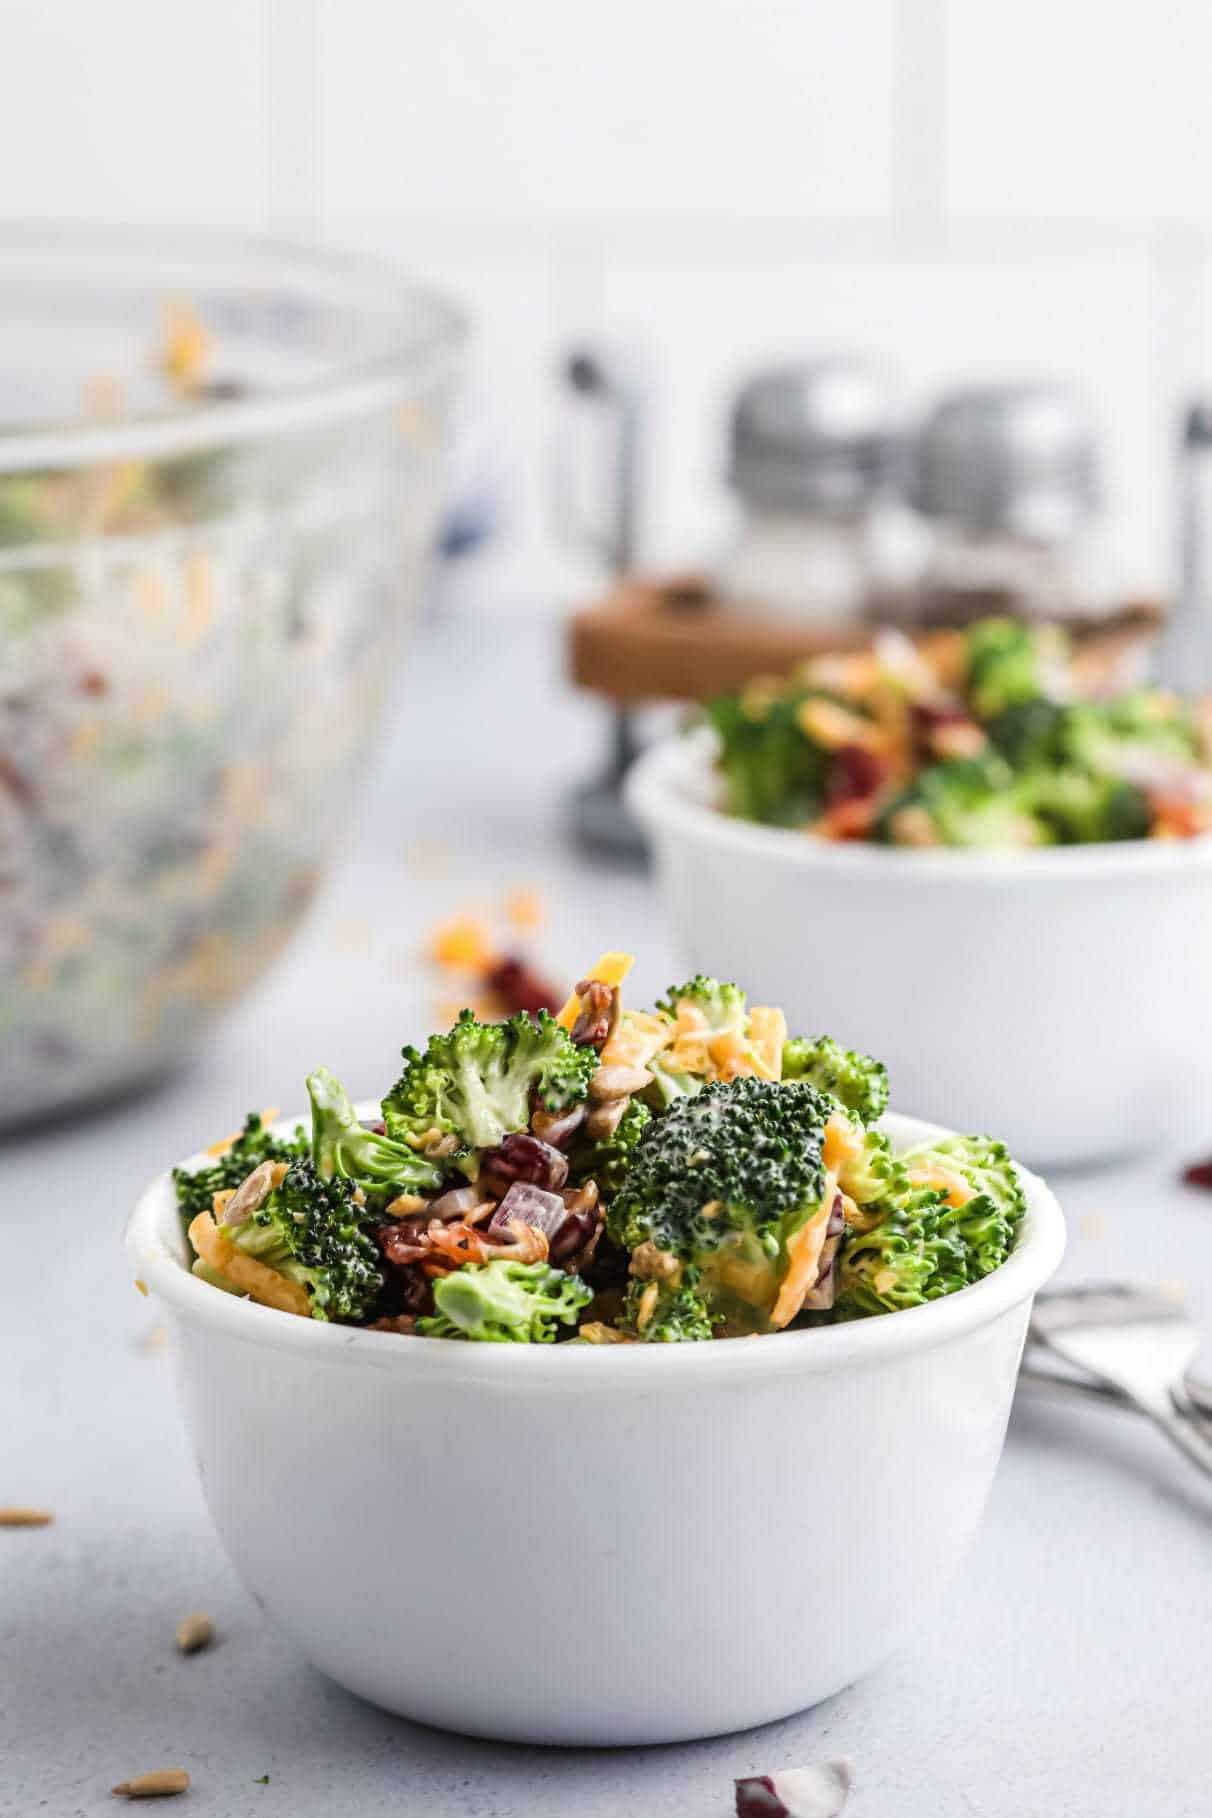 Broccoli salad in a white salad bowl.